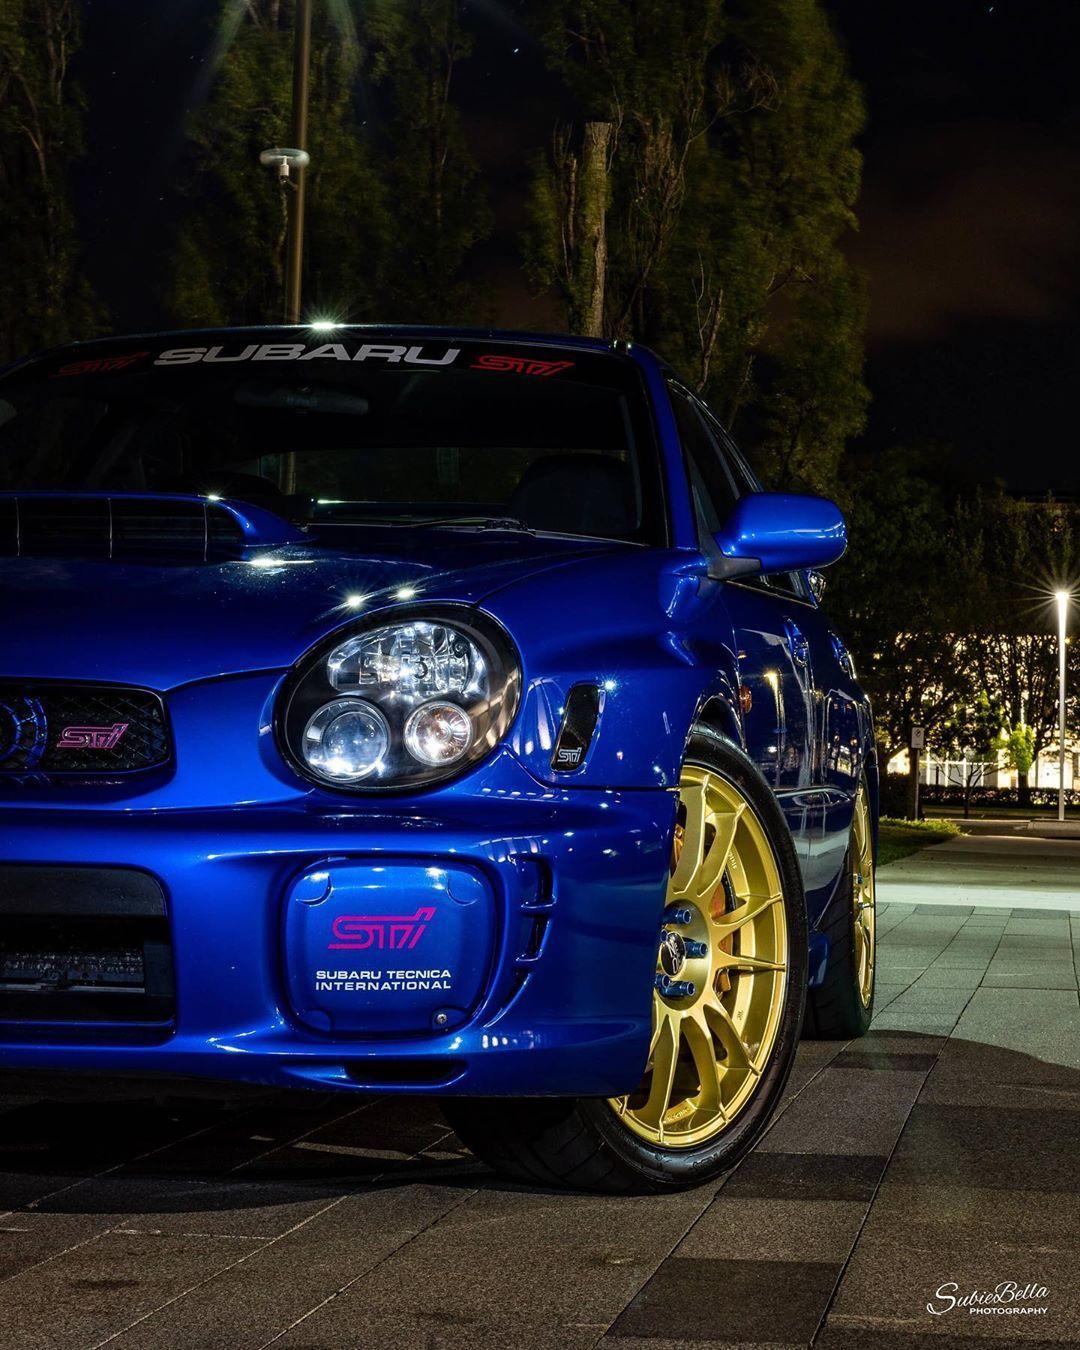 Most Expensive Subaru : expensive, subaru, Build, Directly, Represents, Enjoy, Process..., Expensive, Cars,, Super